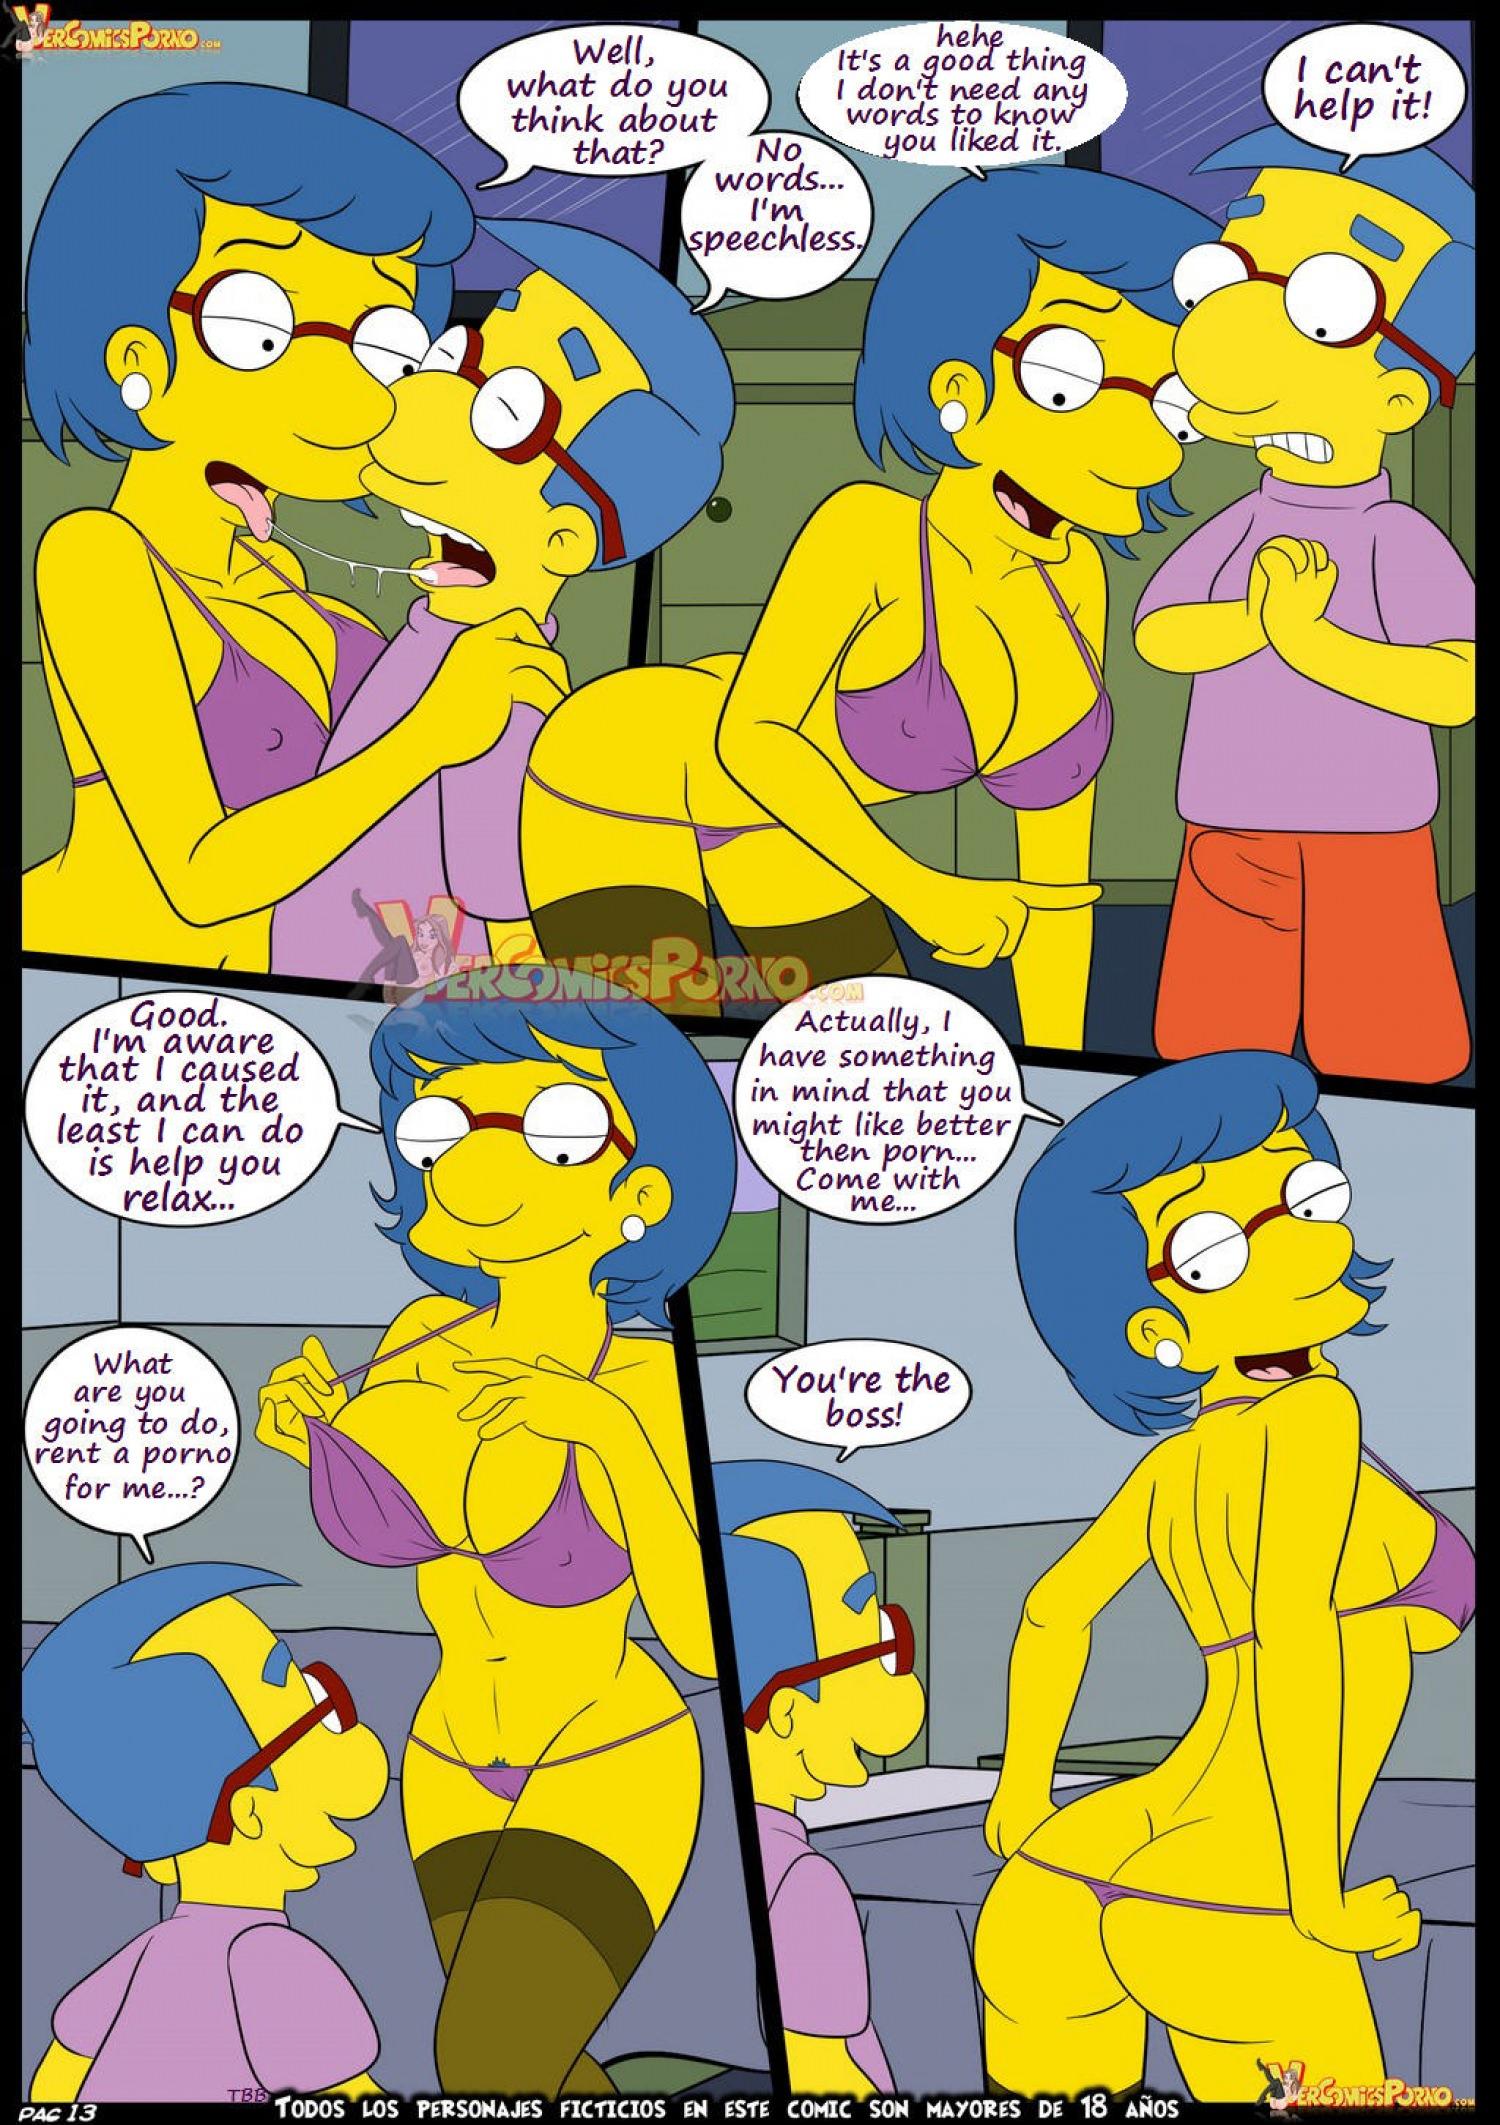 Erotic rectal prolapse